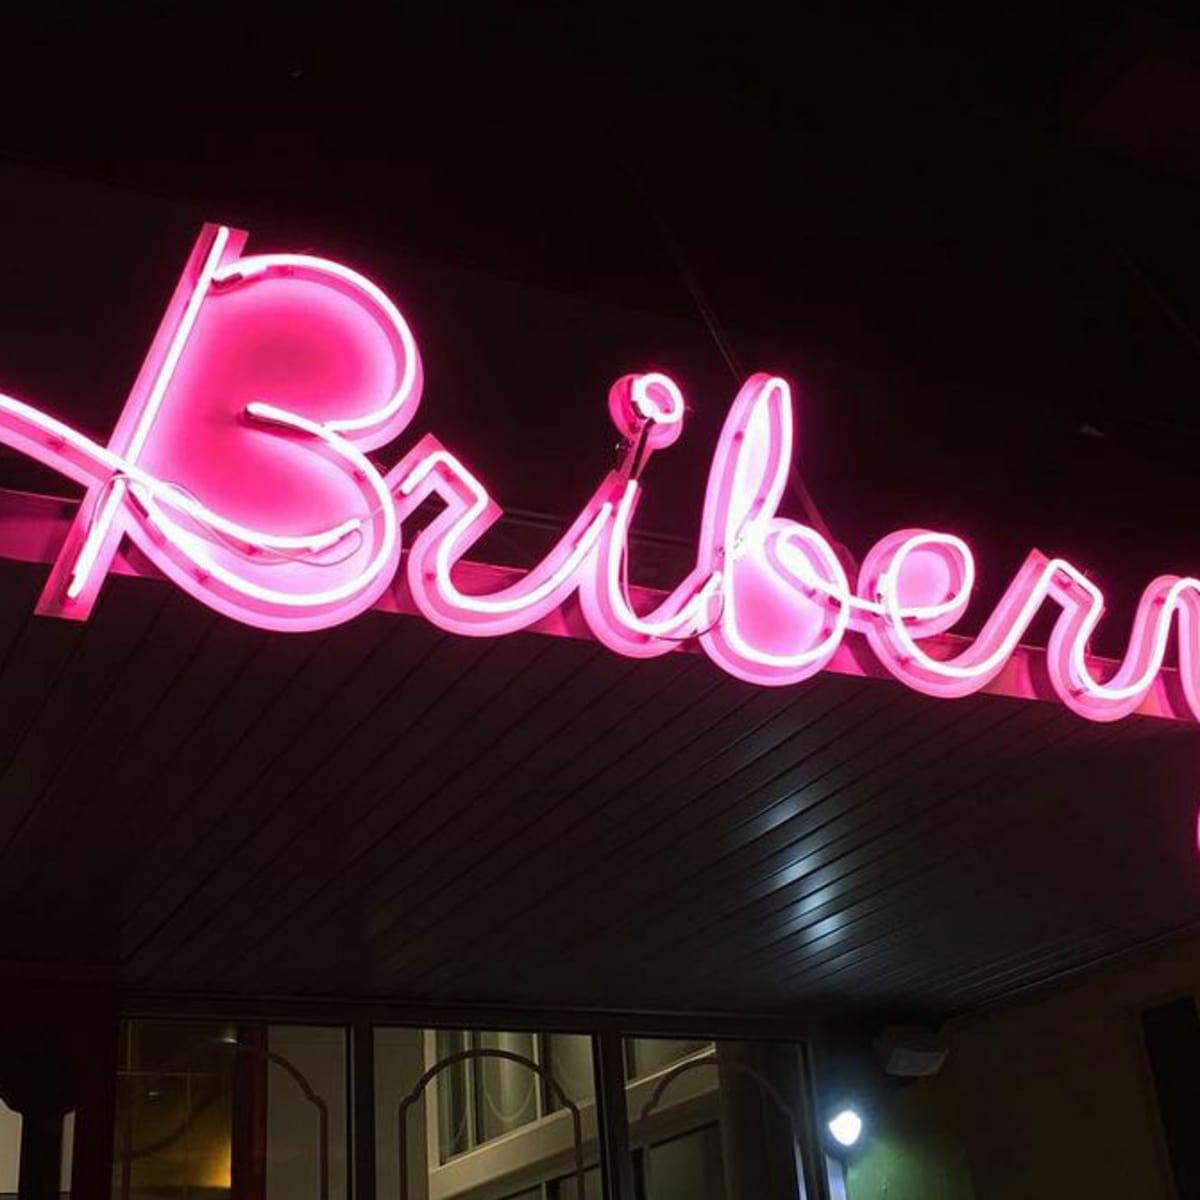 Bribery Bakery Mueller neon sign